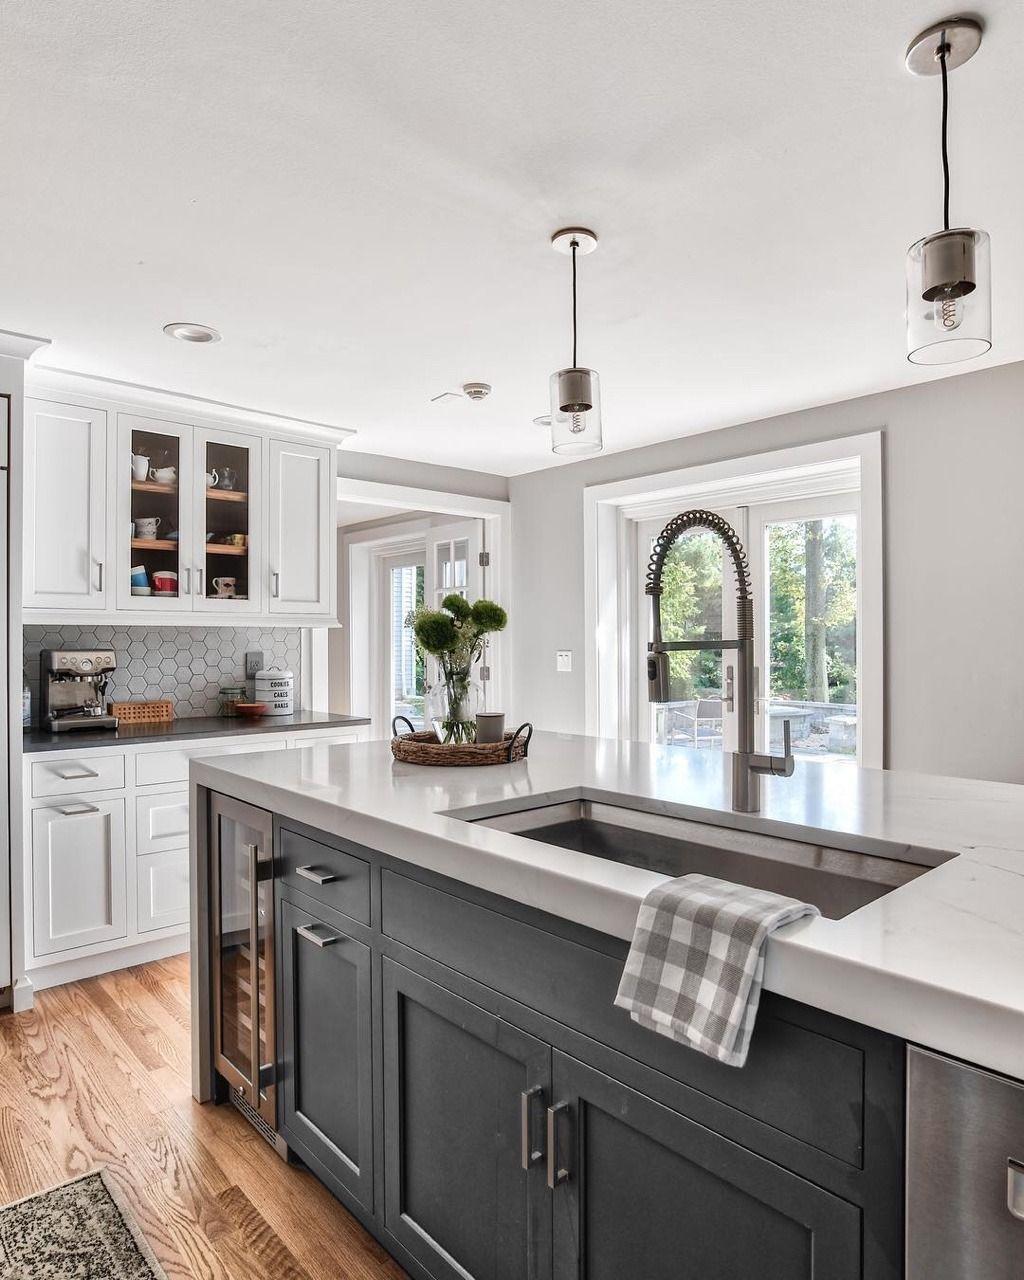 Kitchen Inspiration Chris Veth My Living Interior Design Is The Definitive Resource For Interi Cuisine Moderne Renovation Meuble Cuisine Armoire De Cuisine